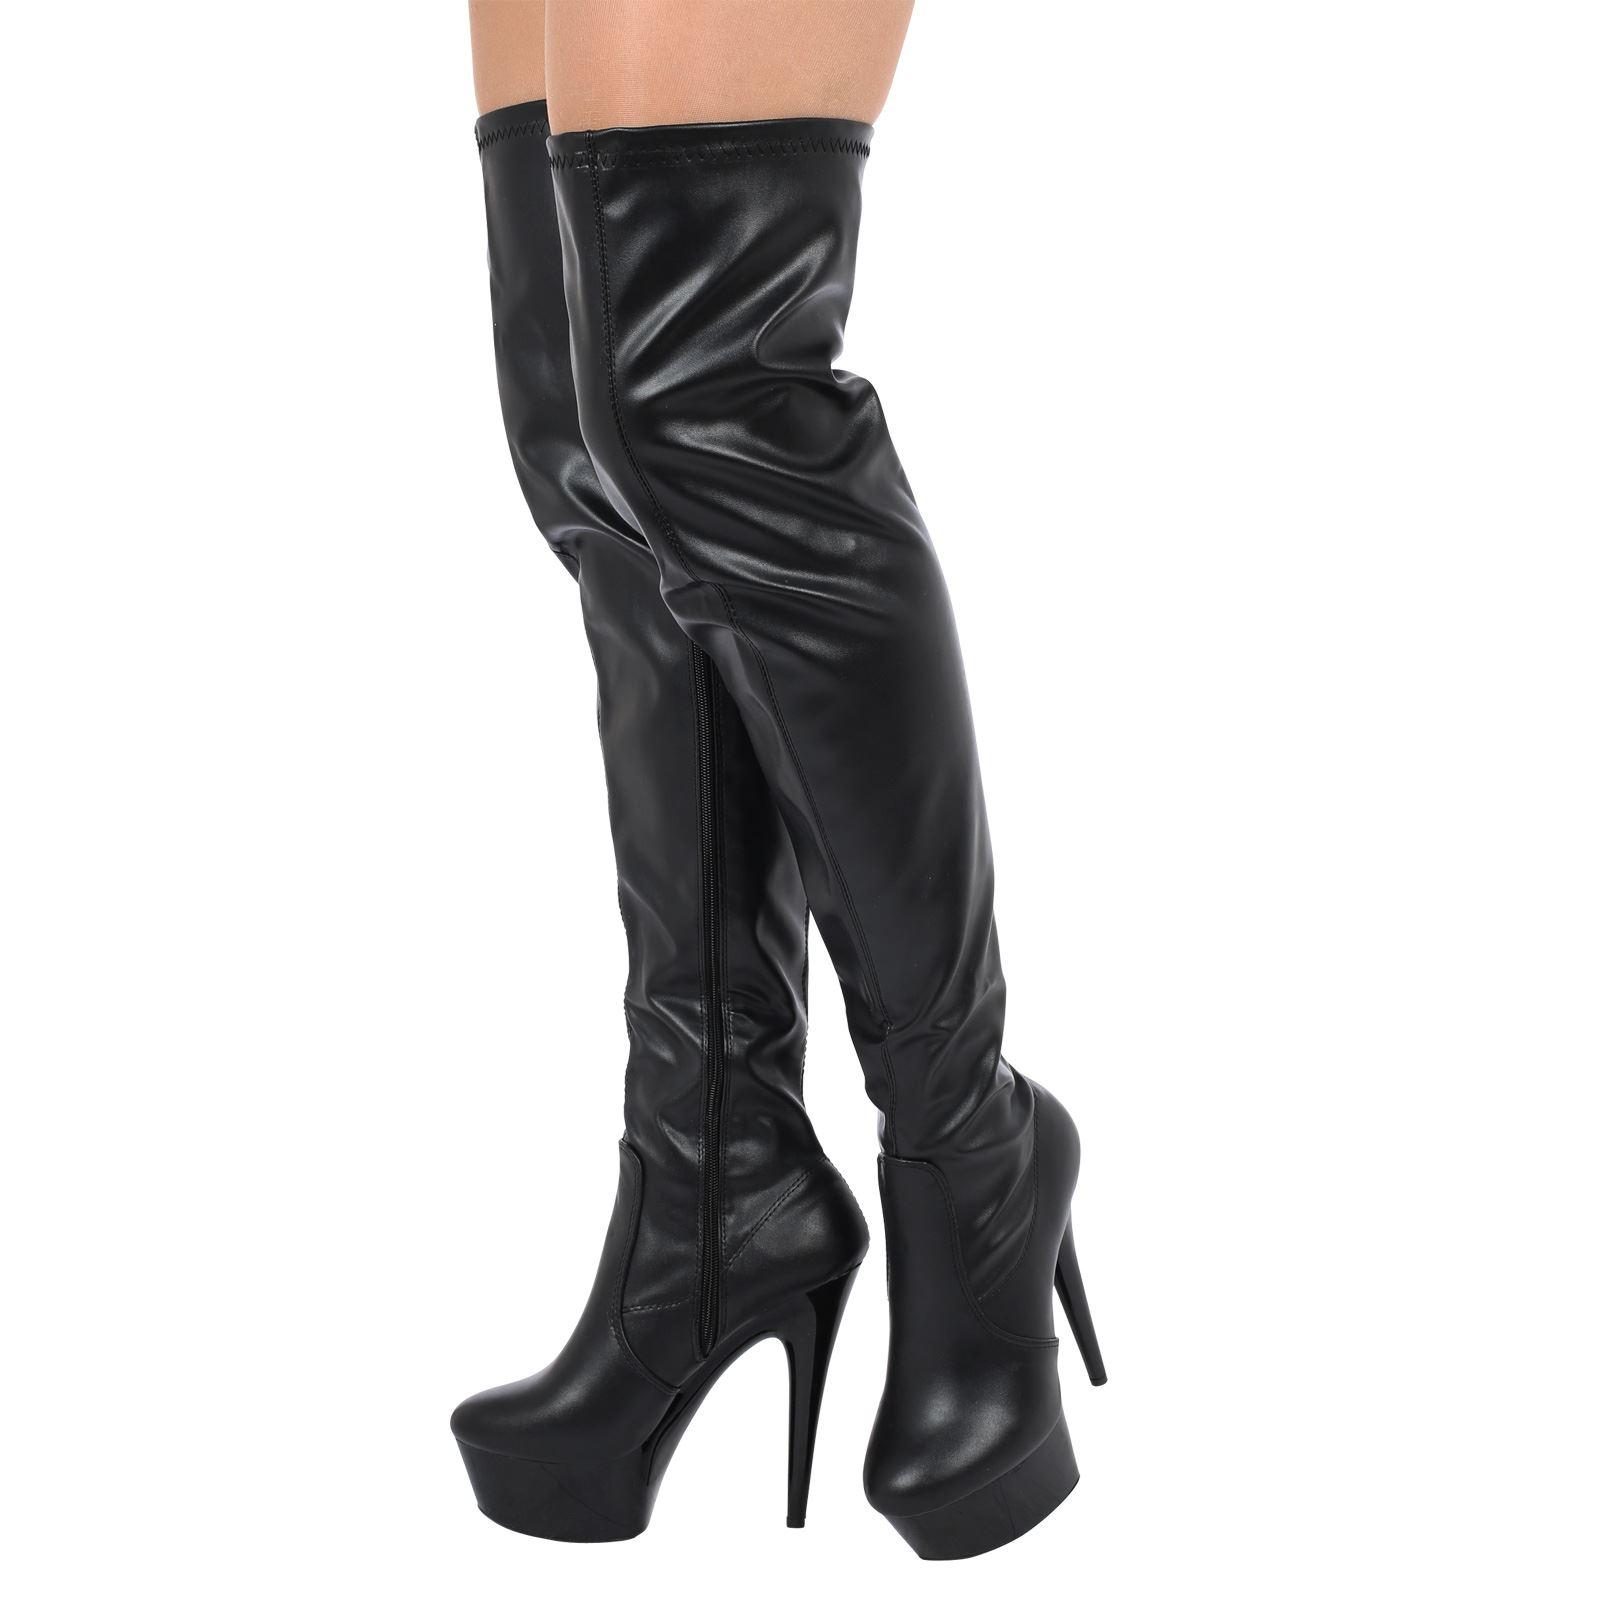 Fetish platform thigh boots August